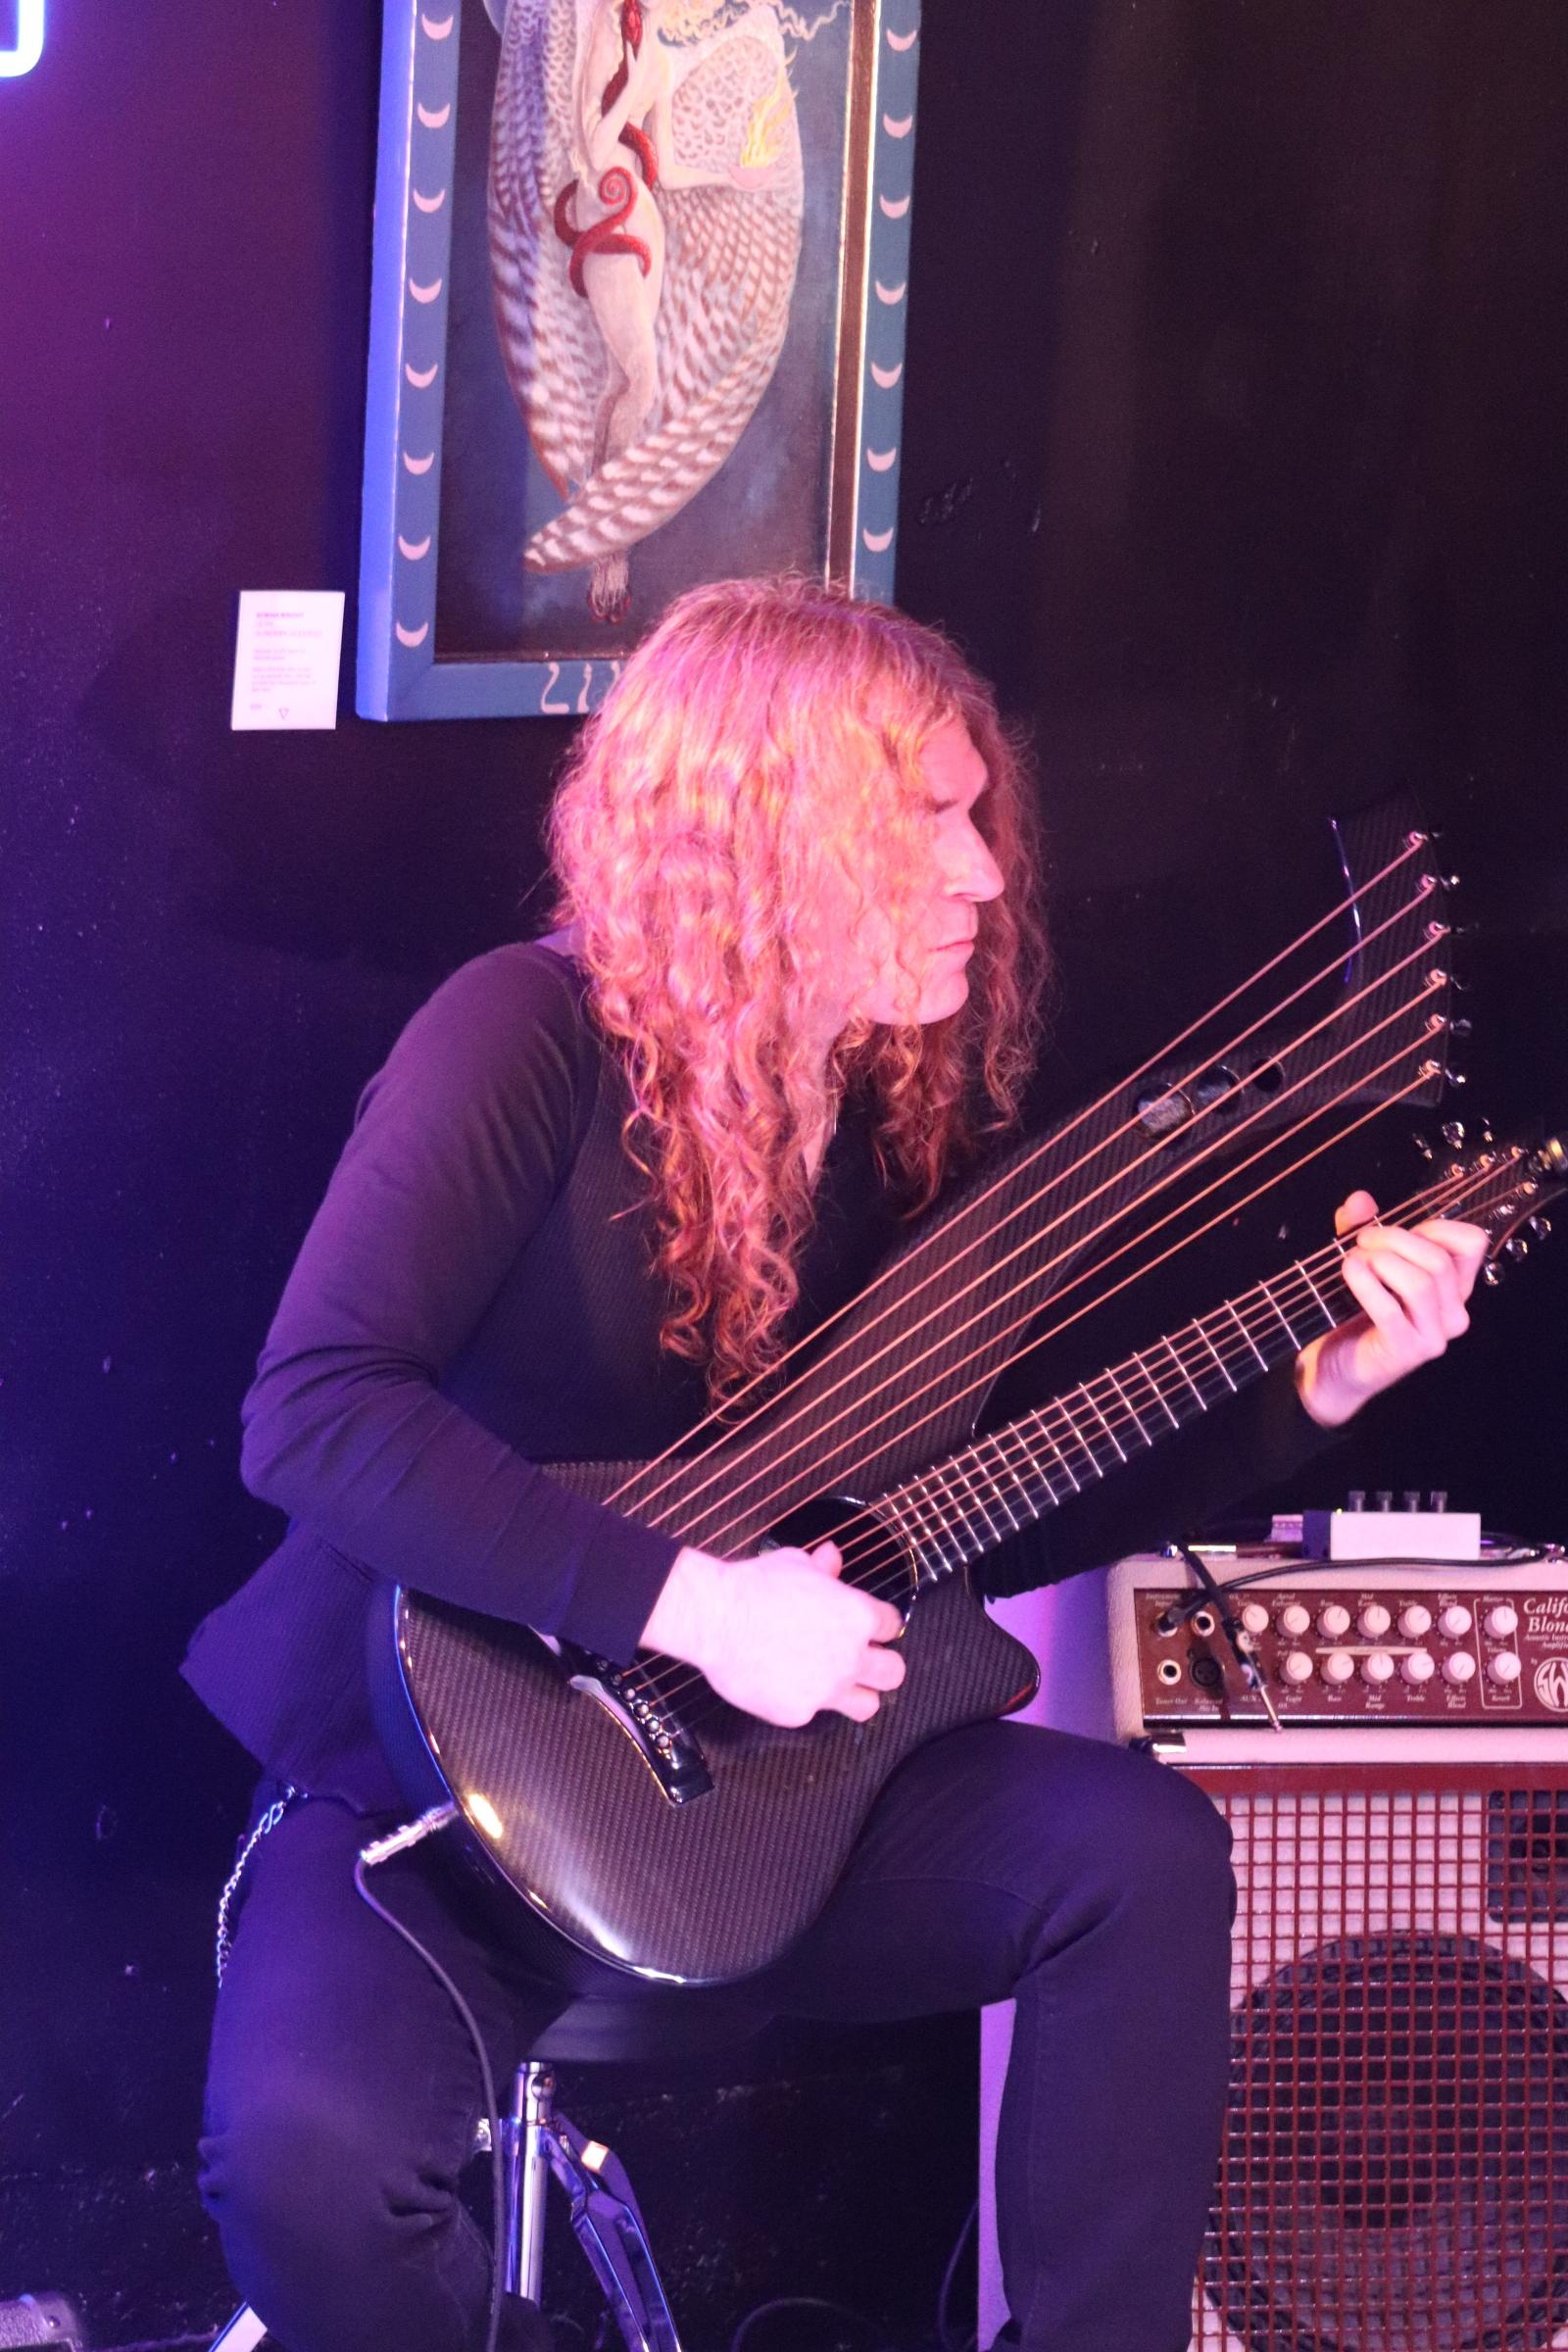 Tim Birtsch of Soul Resonance providing the beautiful harp guitar backdrop